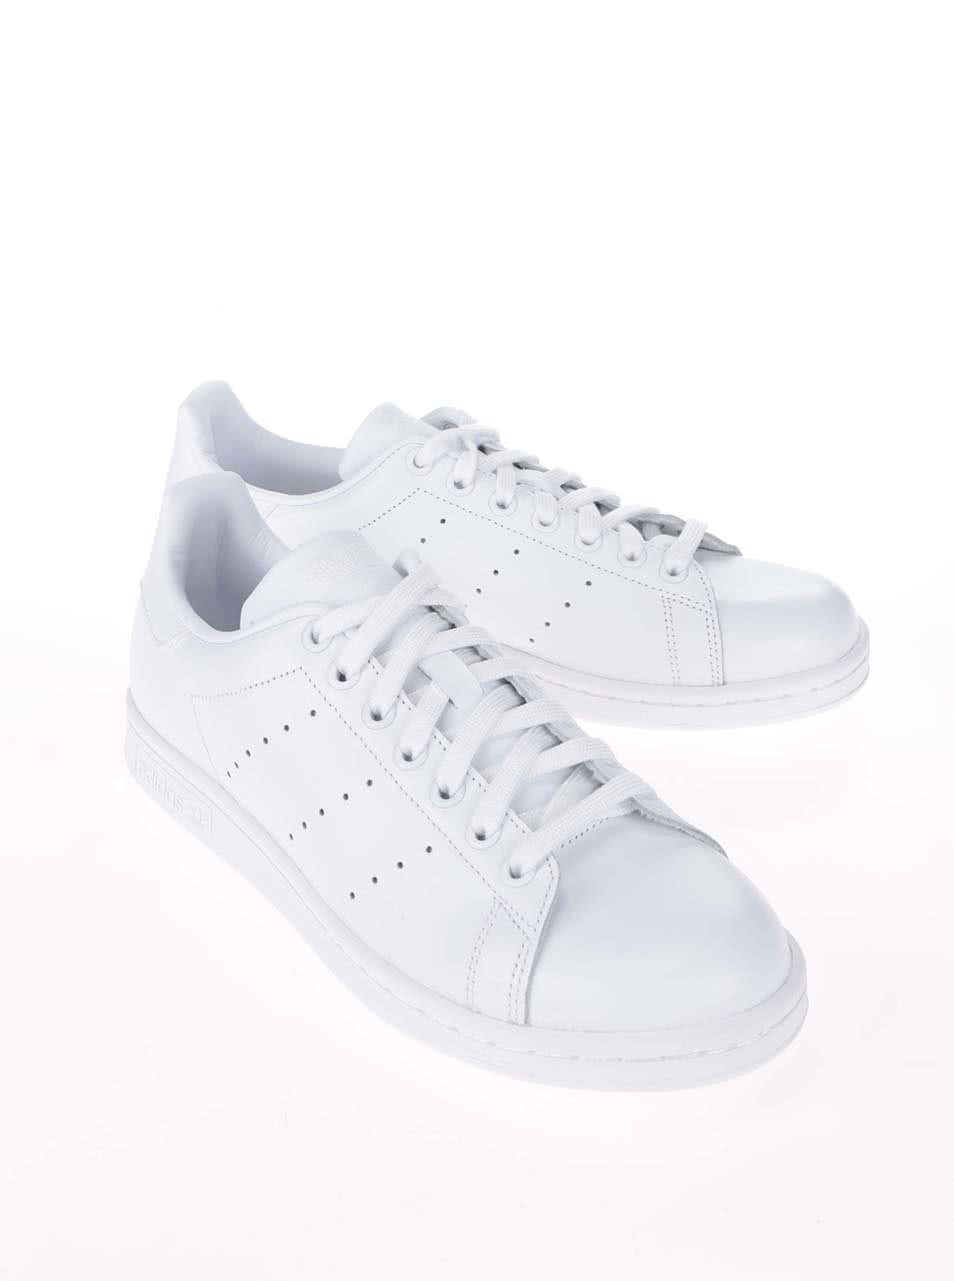 Nový Tenisky Adidas Originals Stan Smith Dámské Stříbrný 63e1672b0c8